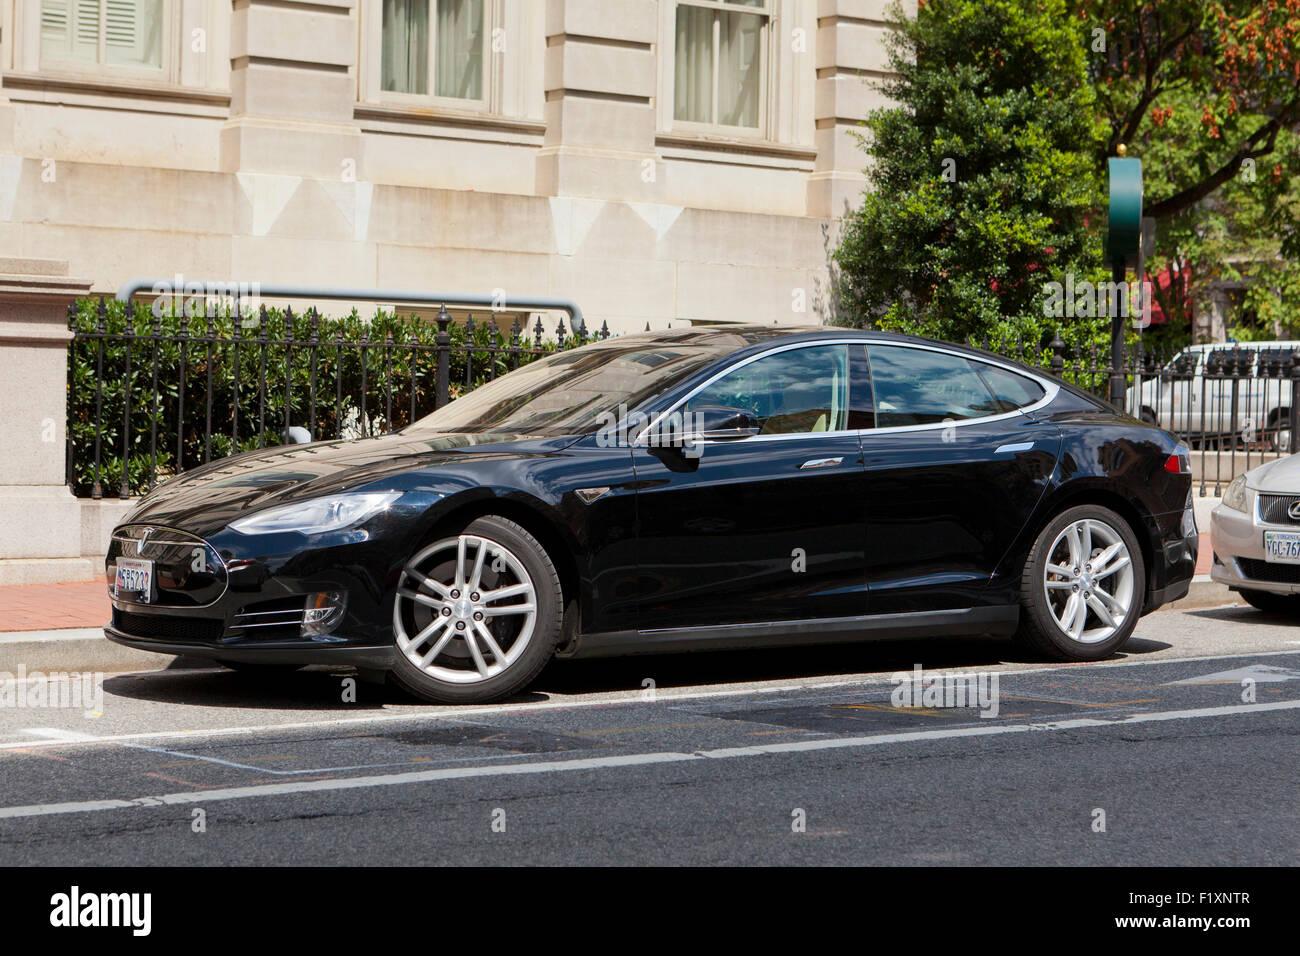 Tesla Model S electric car - USA - Stock Image